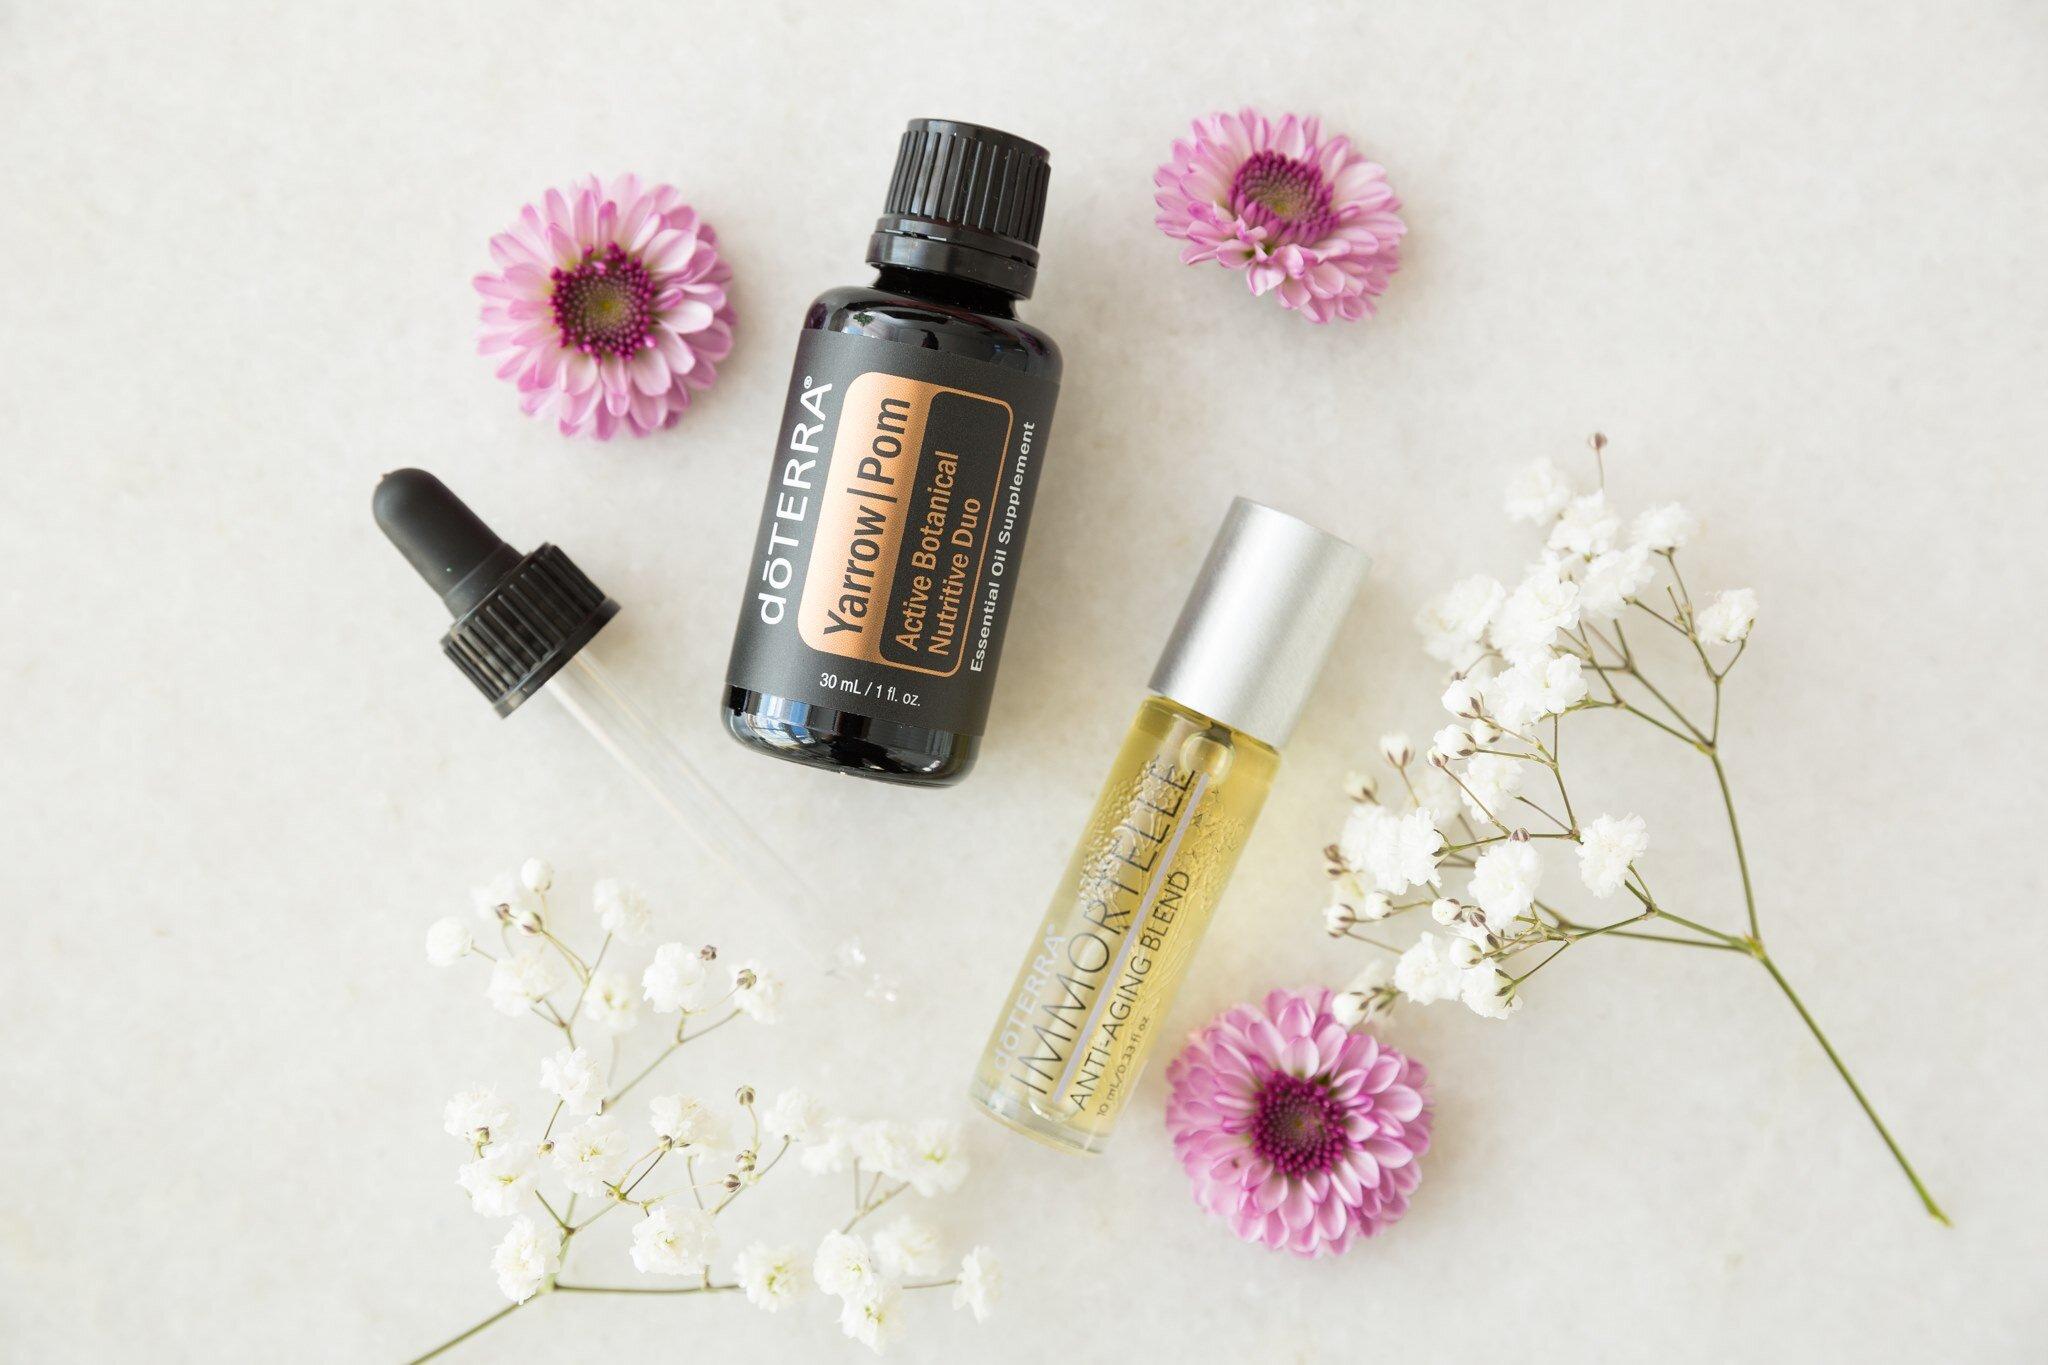 Essential_Oil_Skin_Care_Healing.jpg